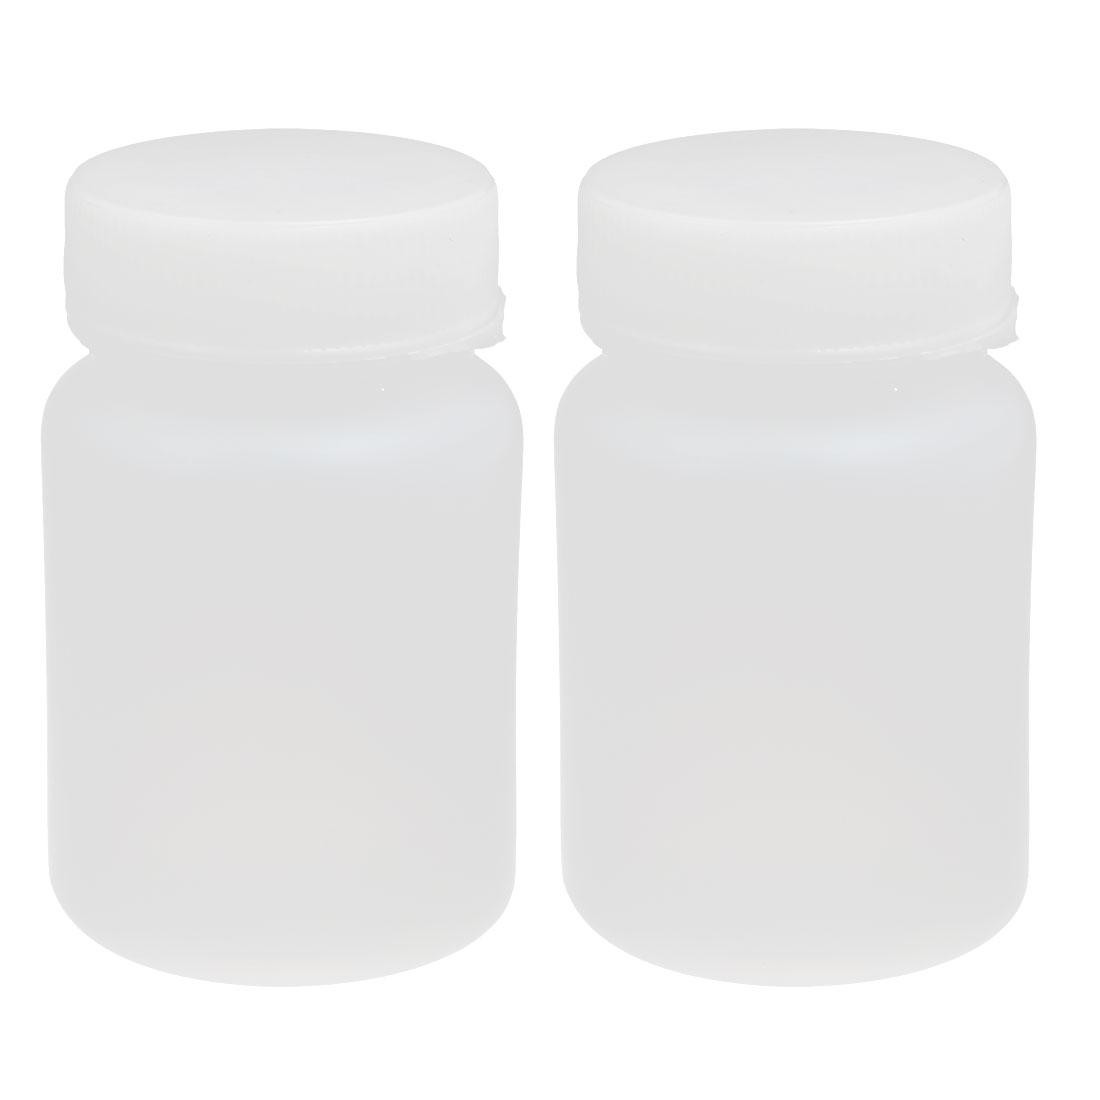 60ml HDPE Plastic Screw Cap Wide Mouth Cylinder Reagent Storage Bottle White 2pcs